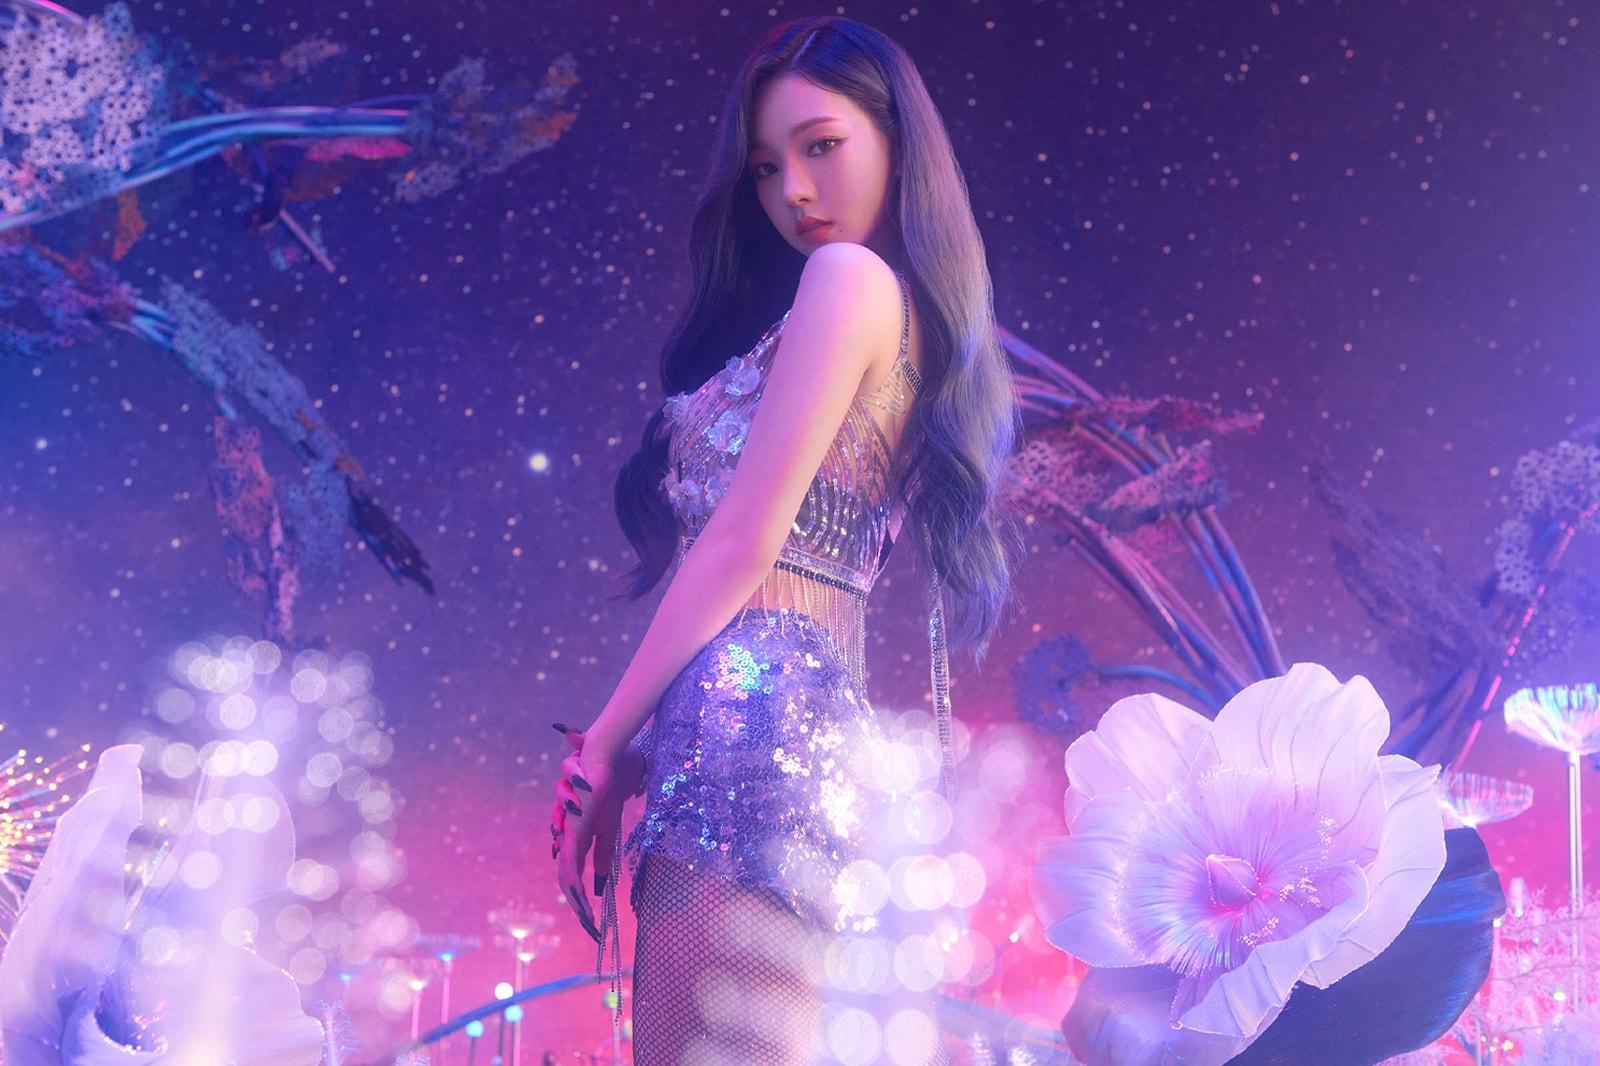 sm entertainment aespa new k-pop girl group virtual human karina